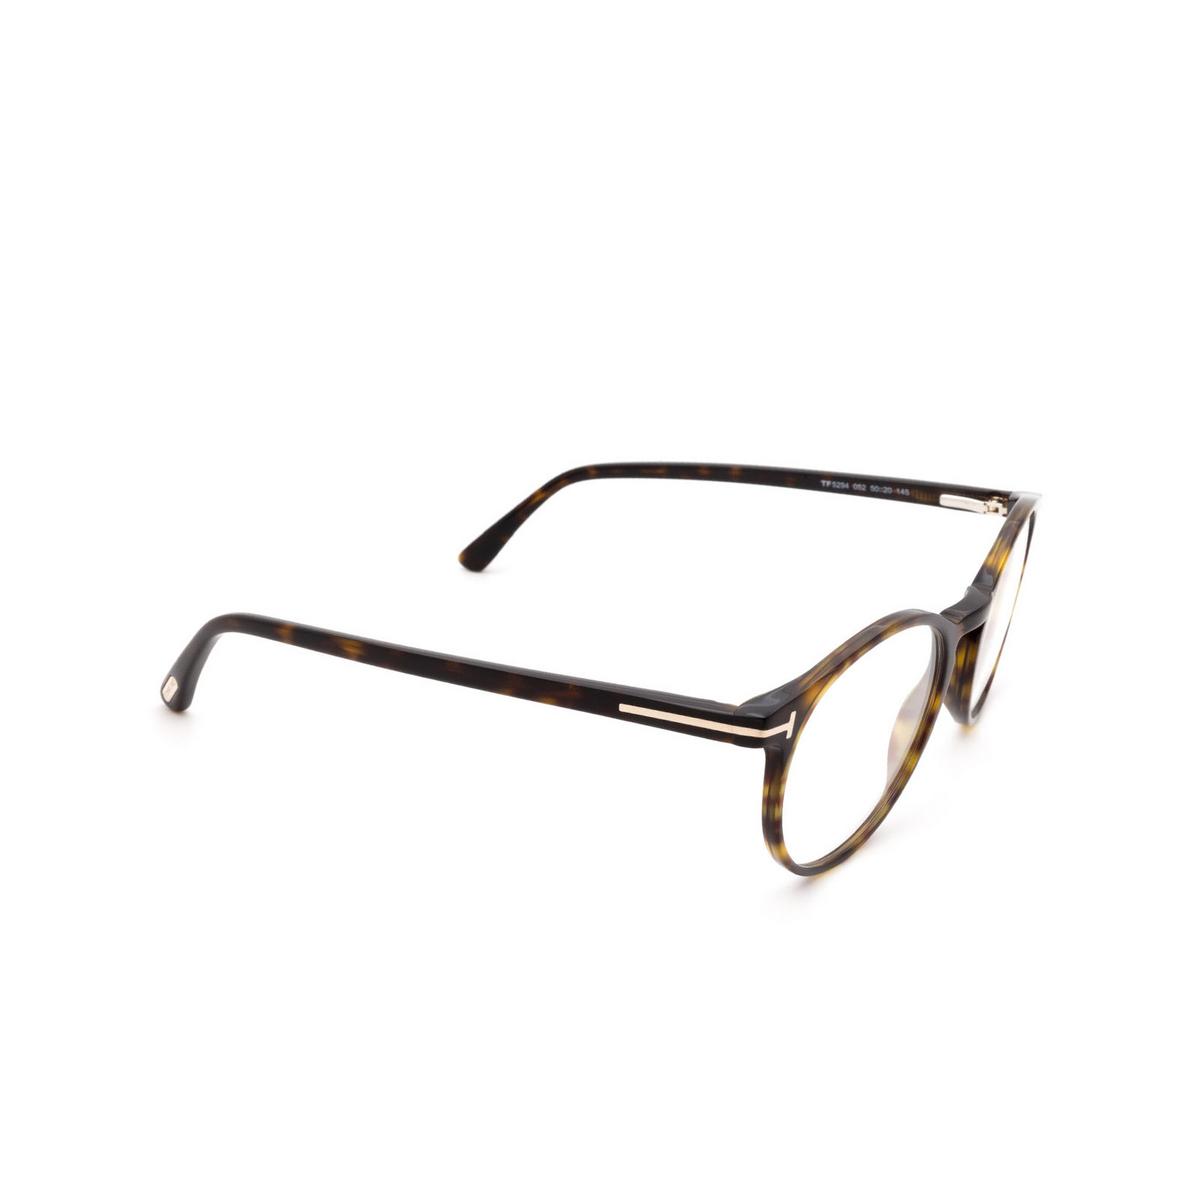 Tom Ford® Round Eyeglasses: FT5294 color Dark Havana 052 - three-quarters view.